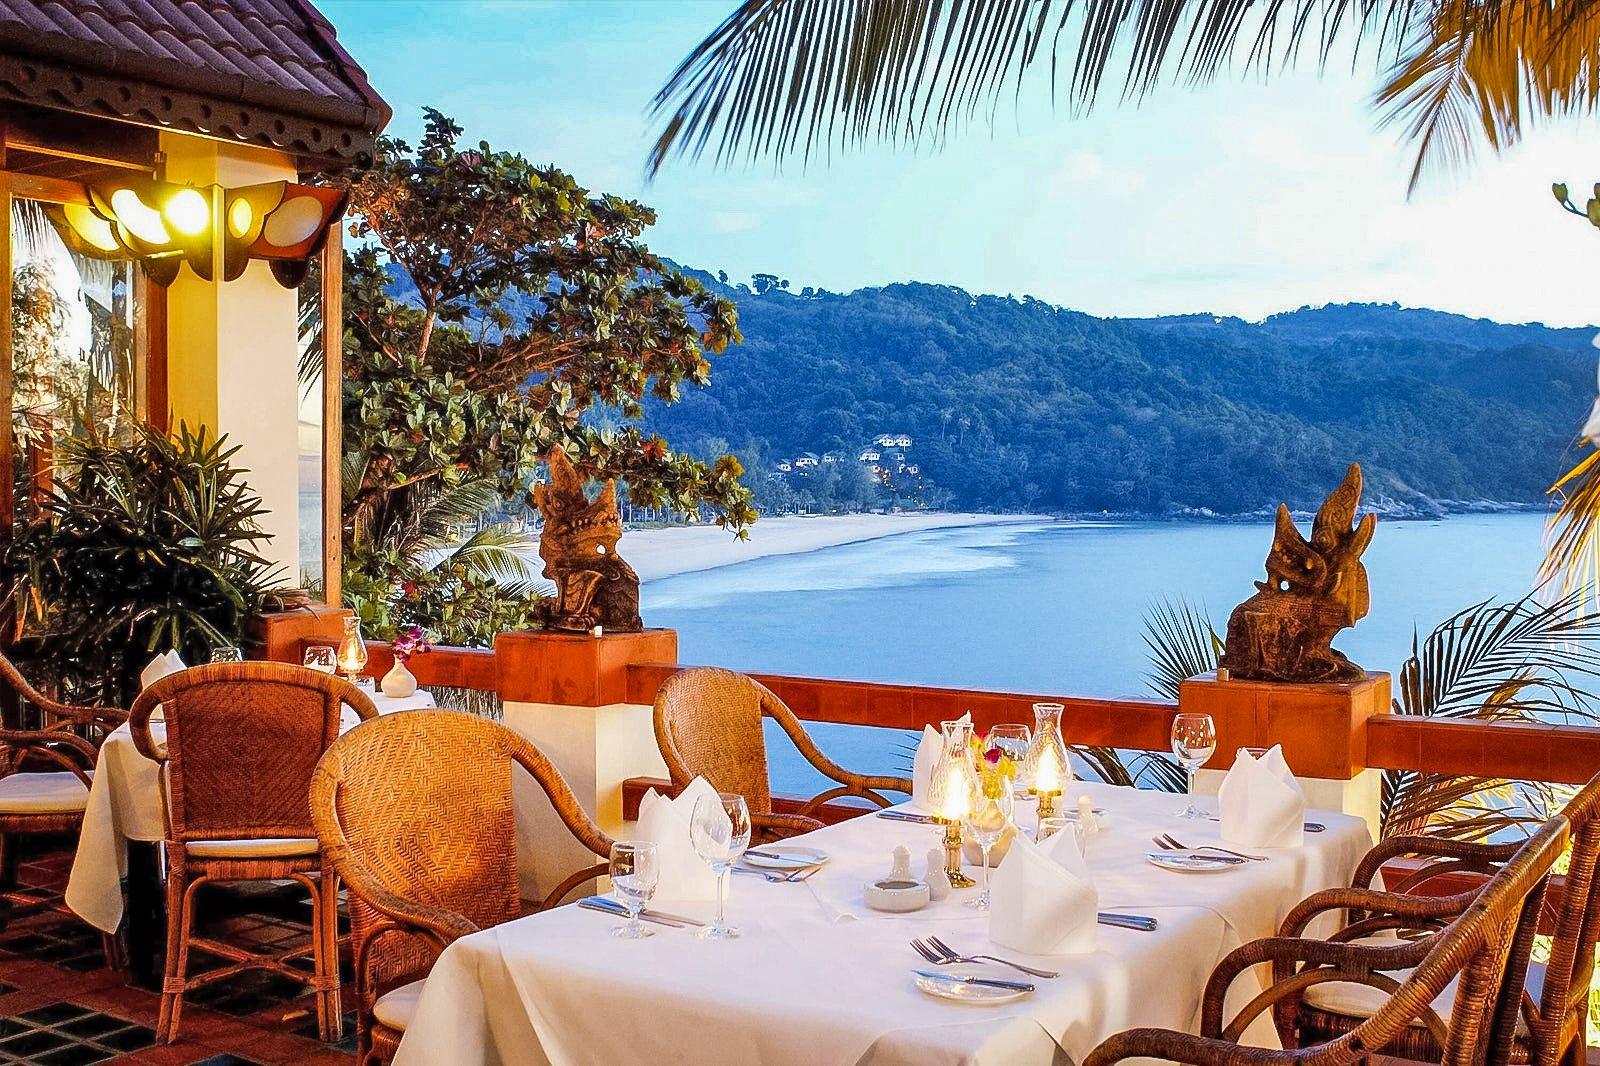 Mom Tri's Kitchen is part of the Villa Royale resort overlooking Kata Noi beach in Phuket, Thailand.